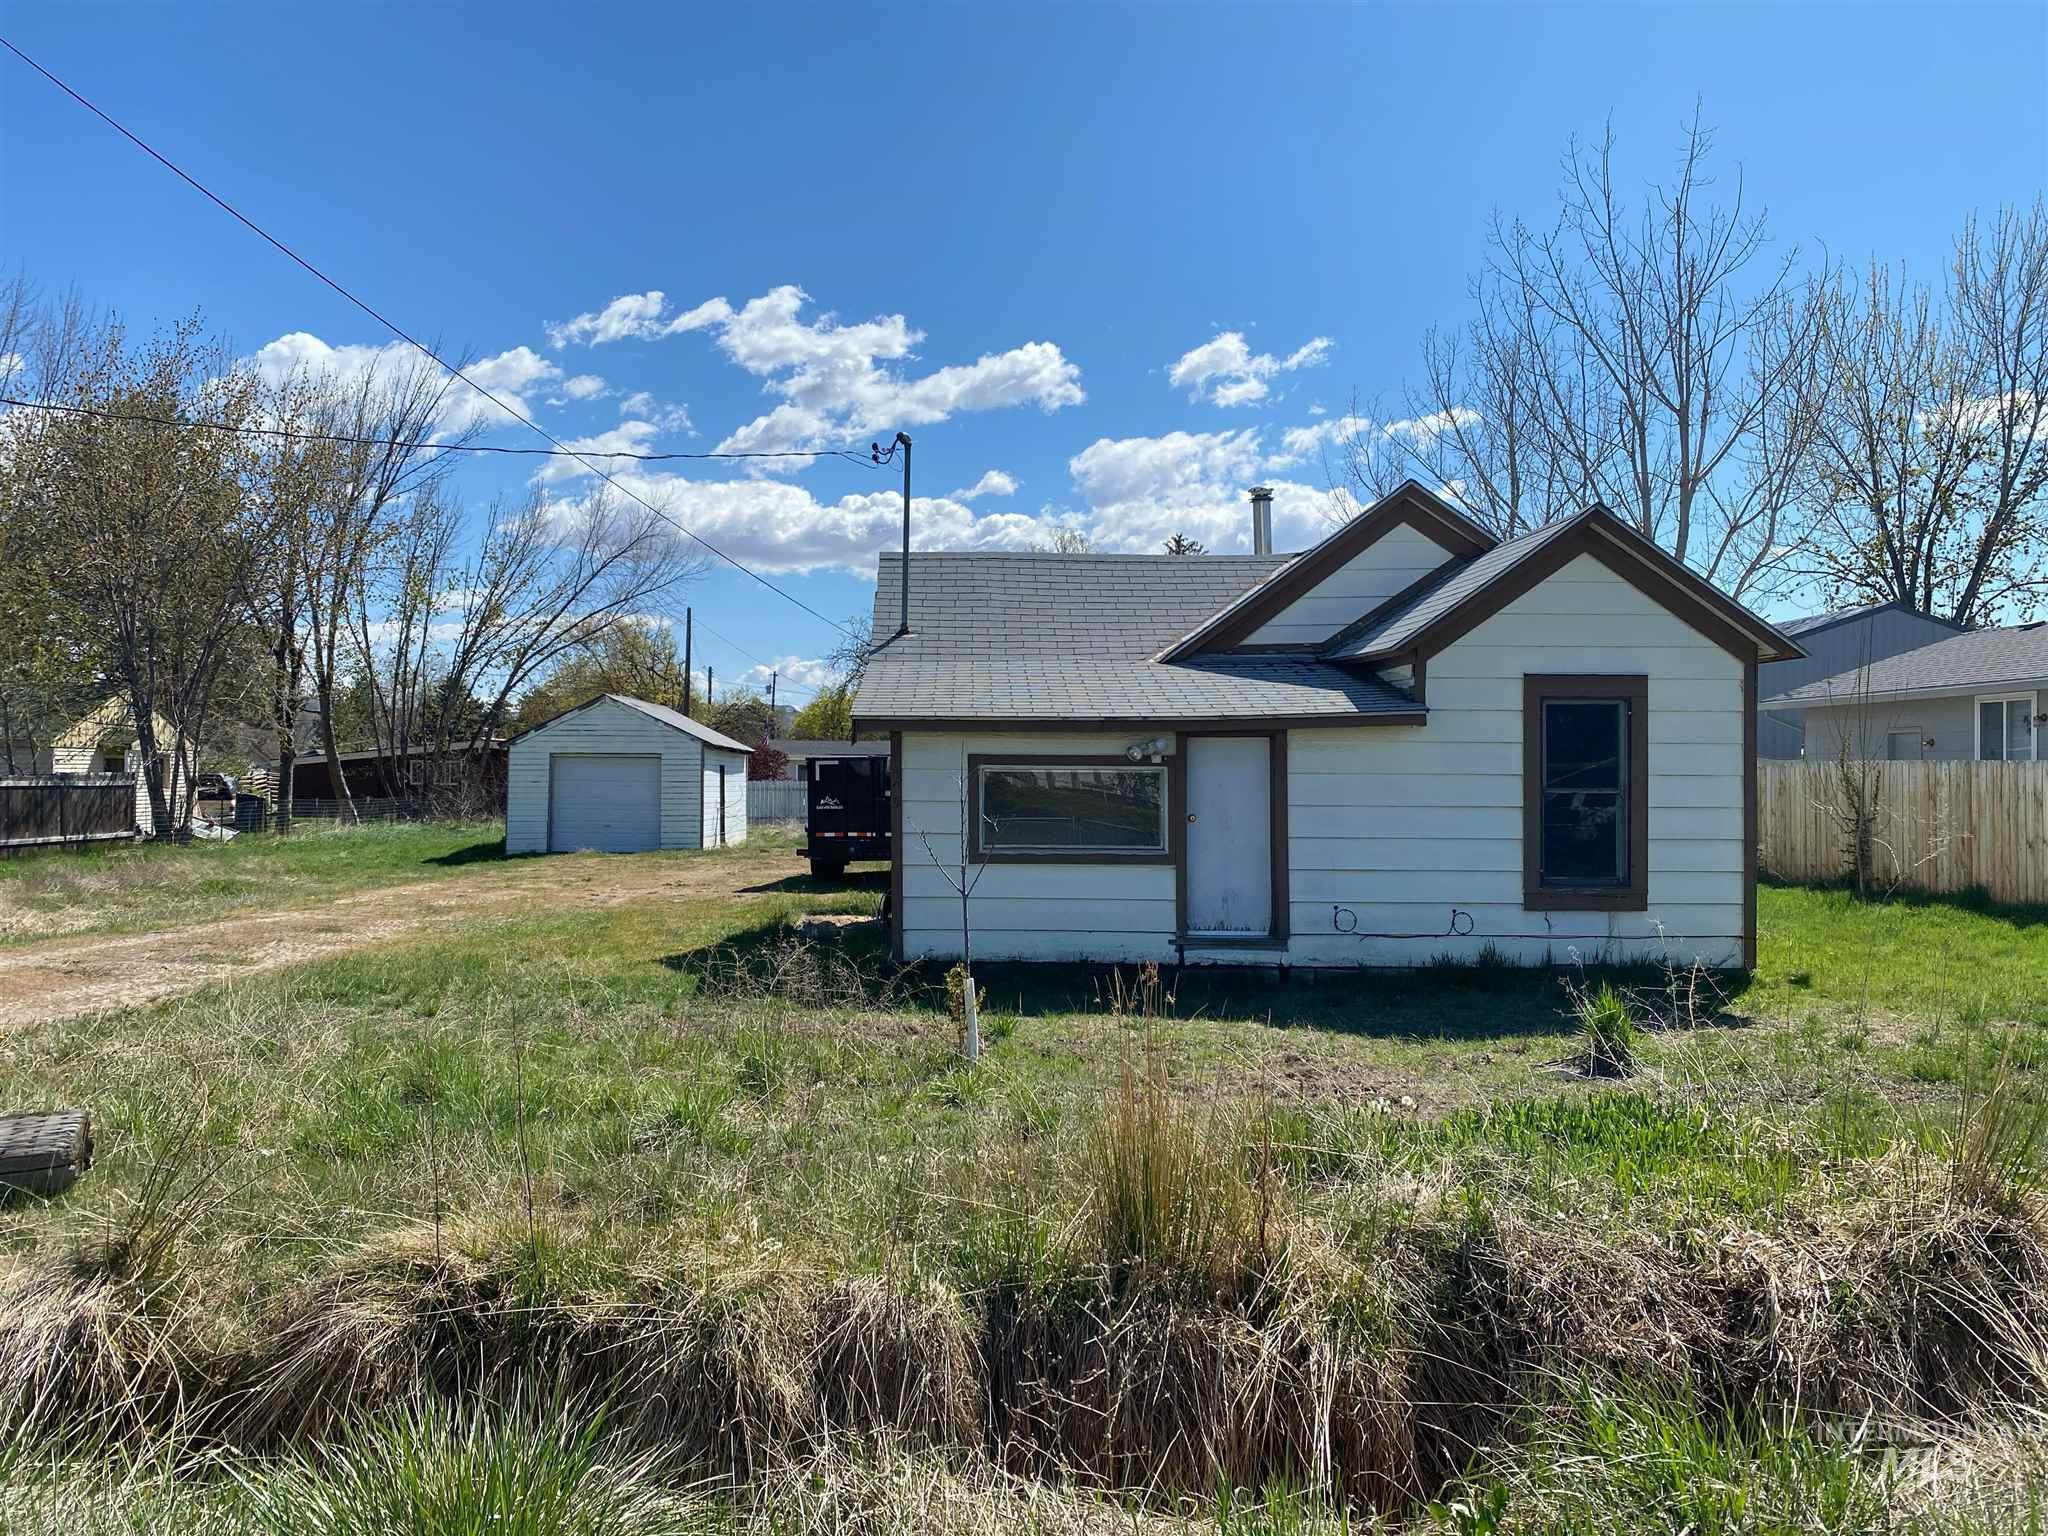 809 E Locust St Property Photo - Emmett, ID real estate listing